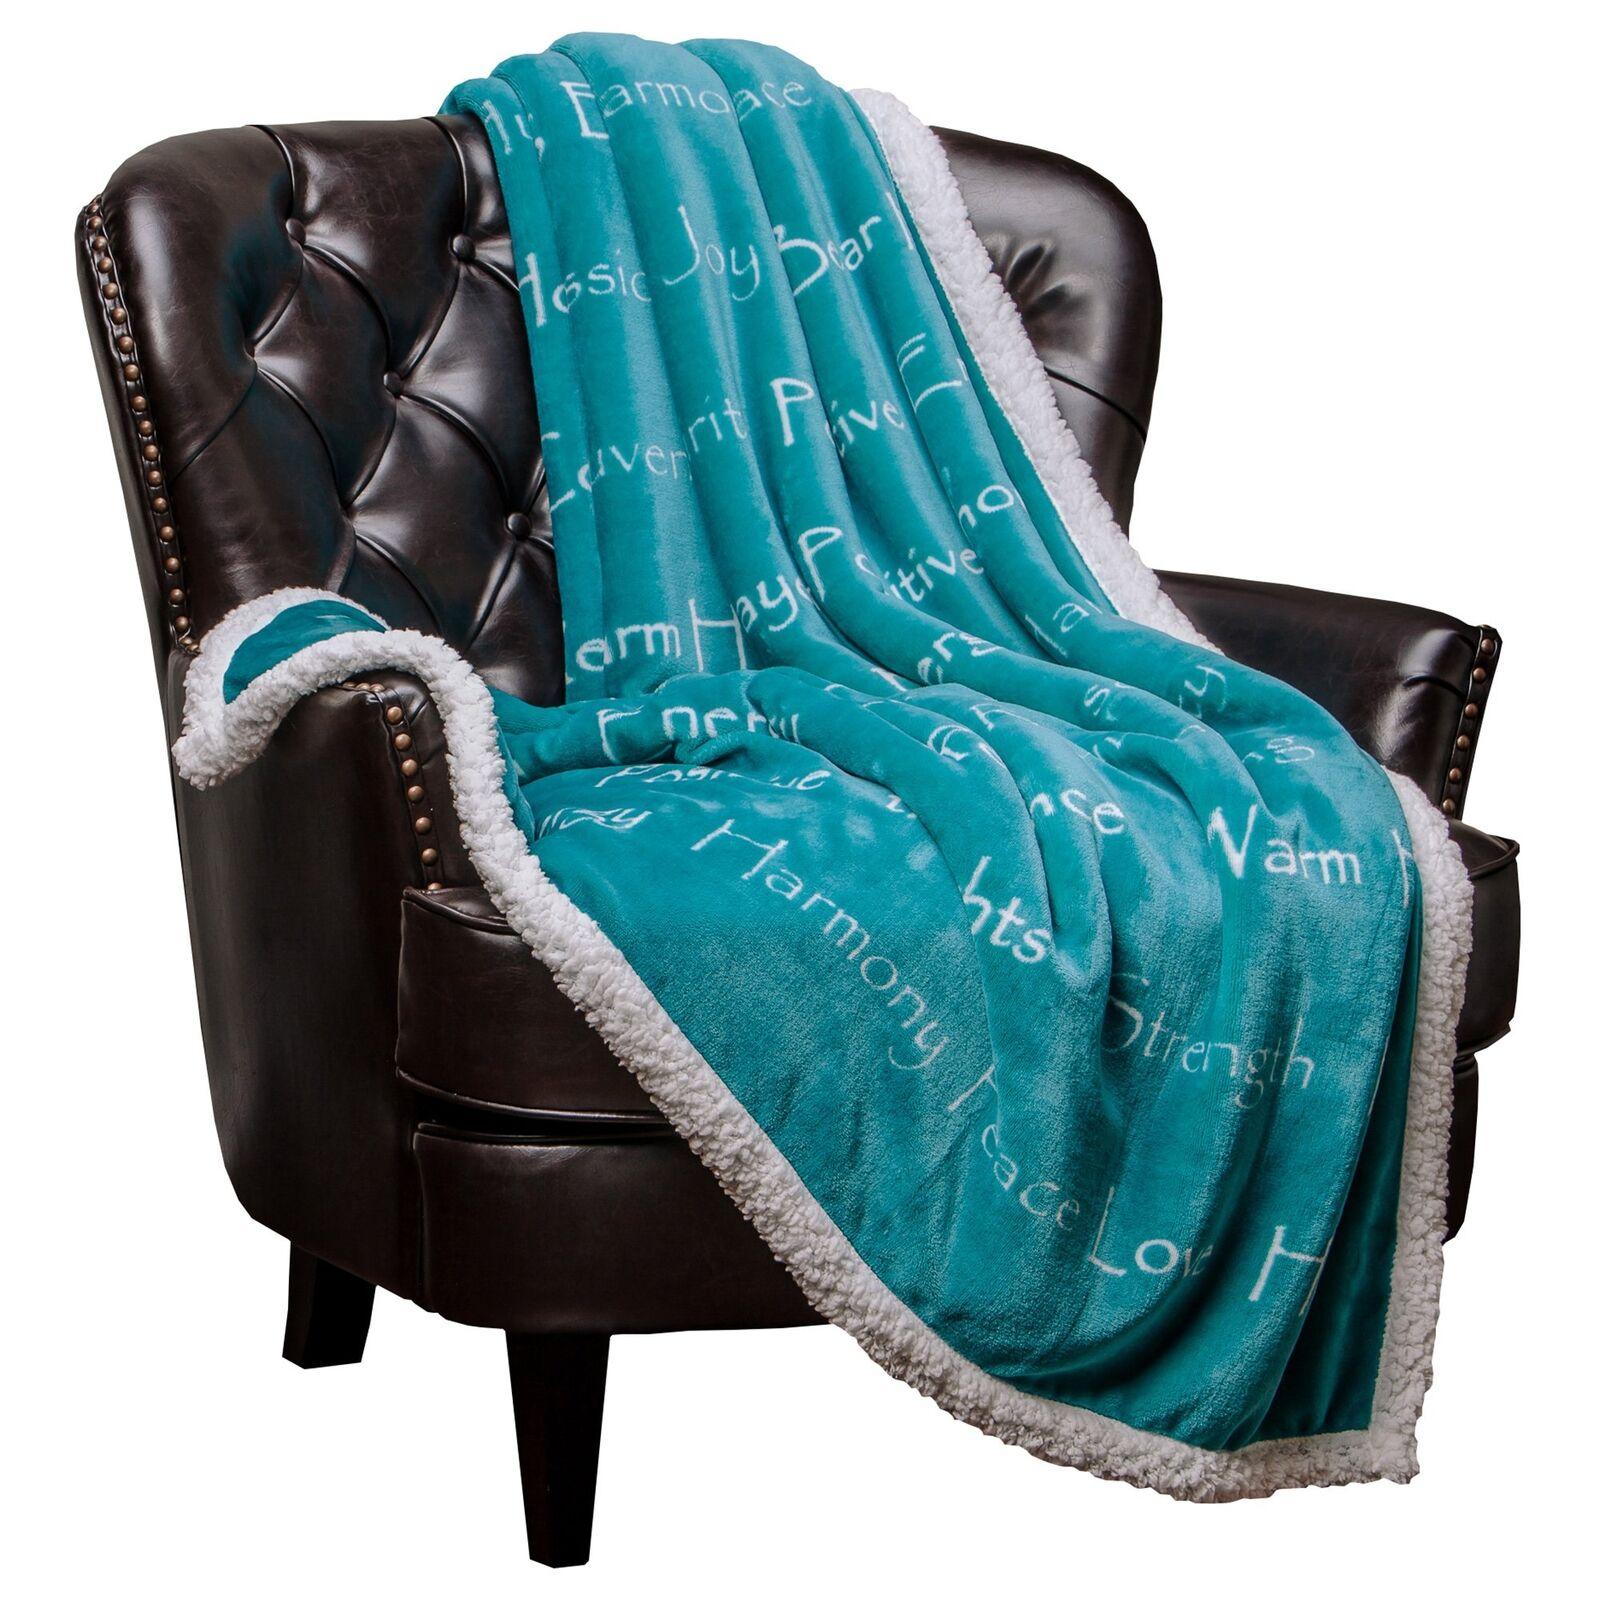 Chanasya Warm Hug Positive Energy Healing Thoughts Throw Blanket - Get Well Soon